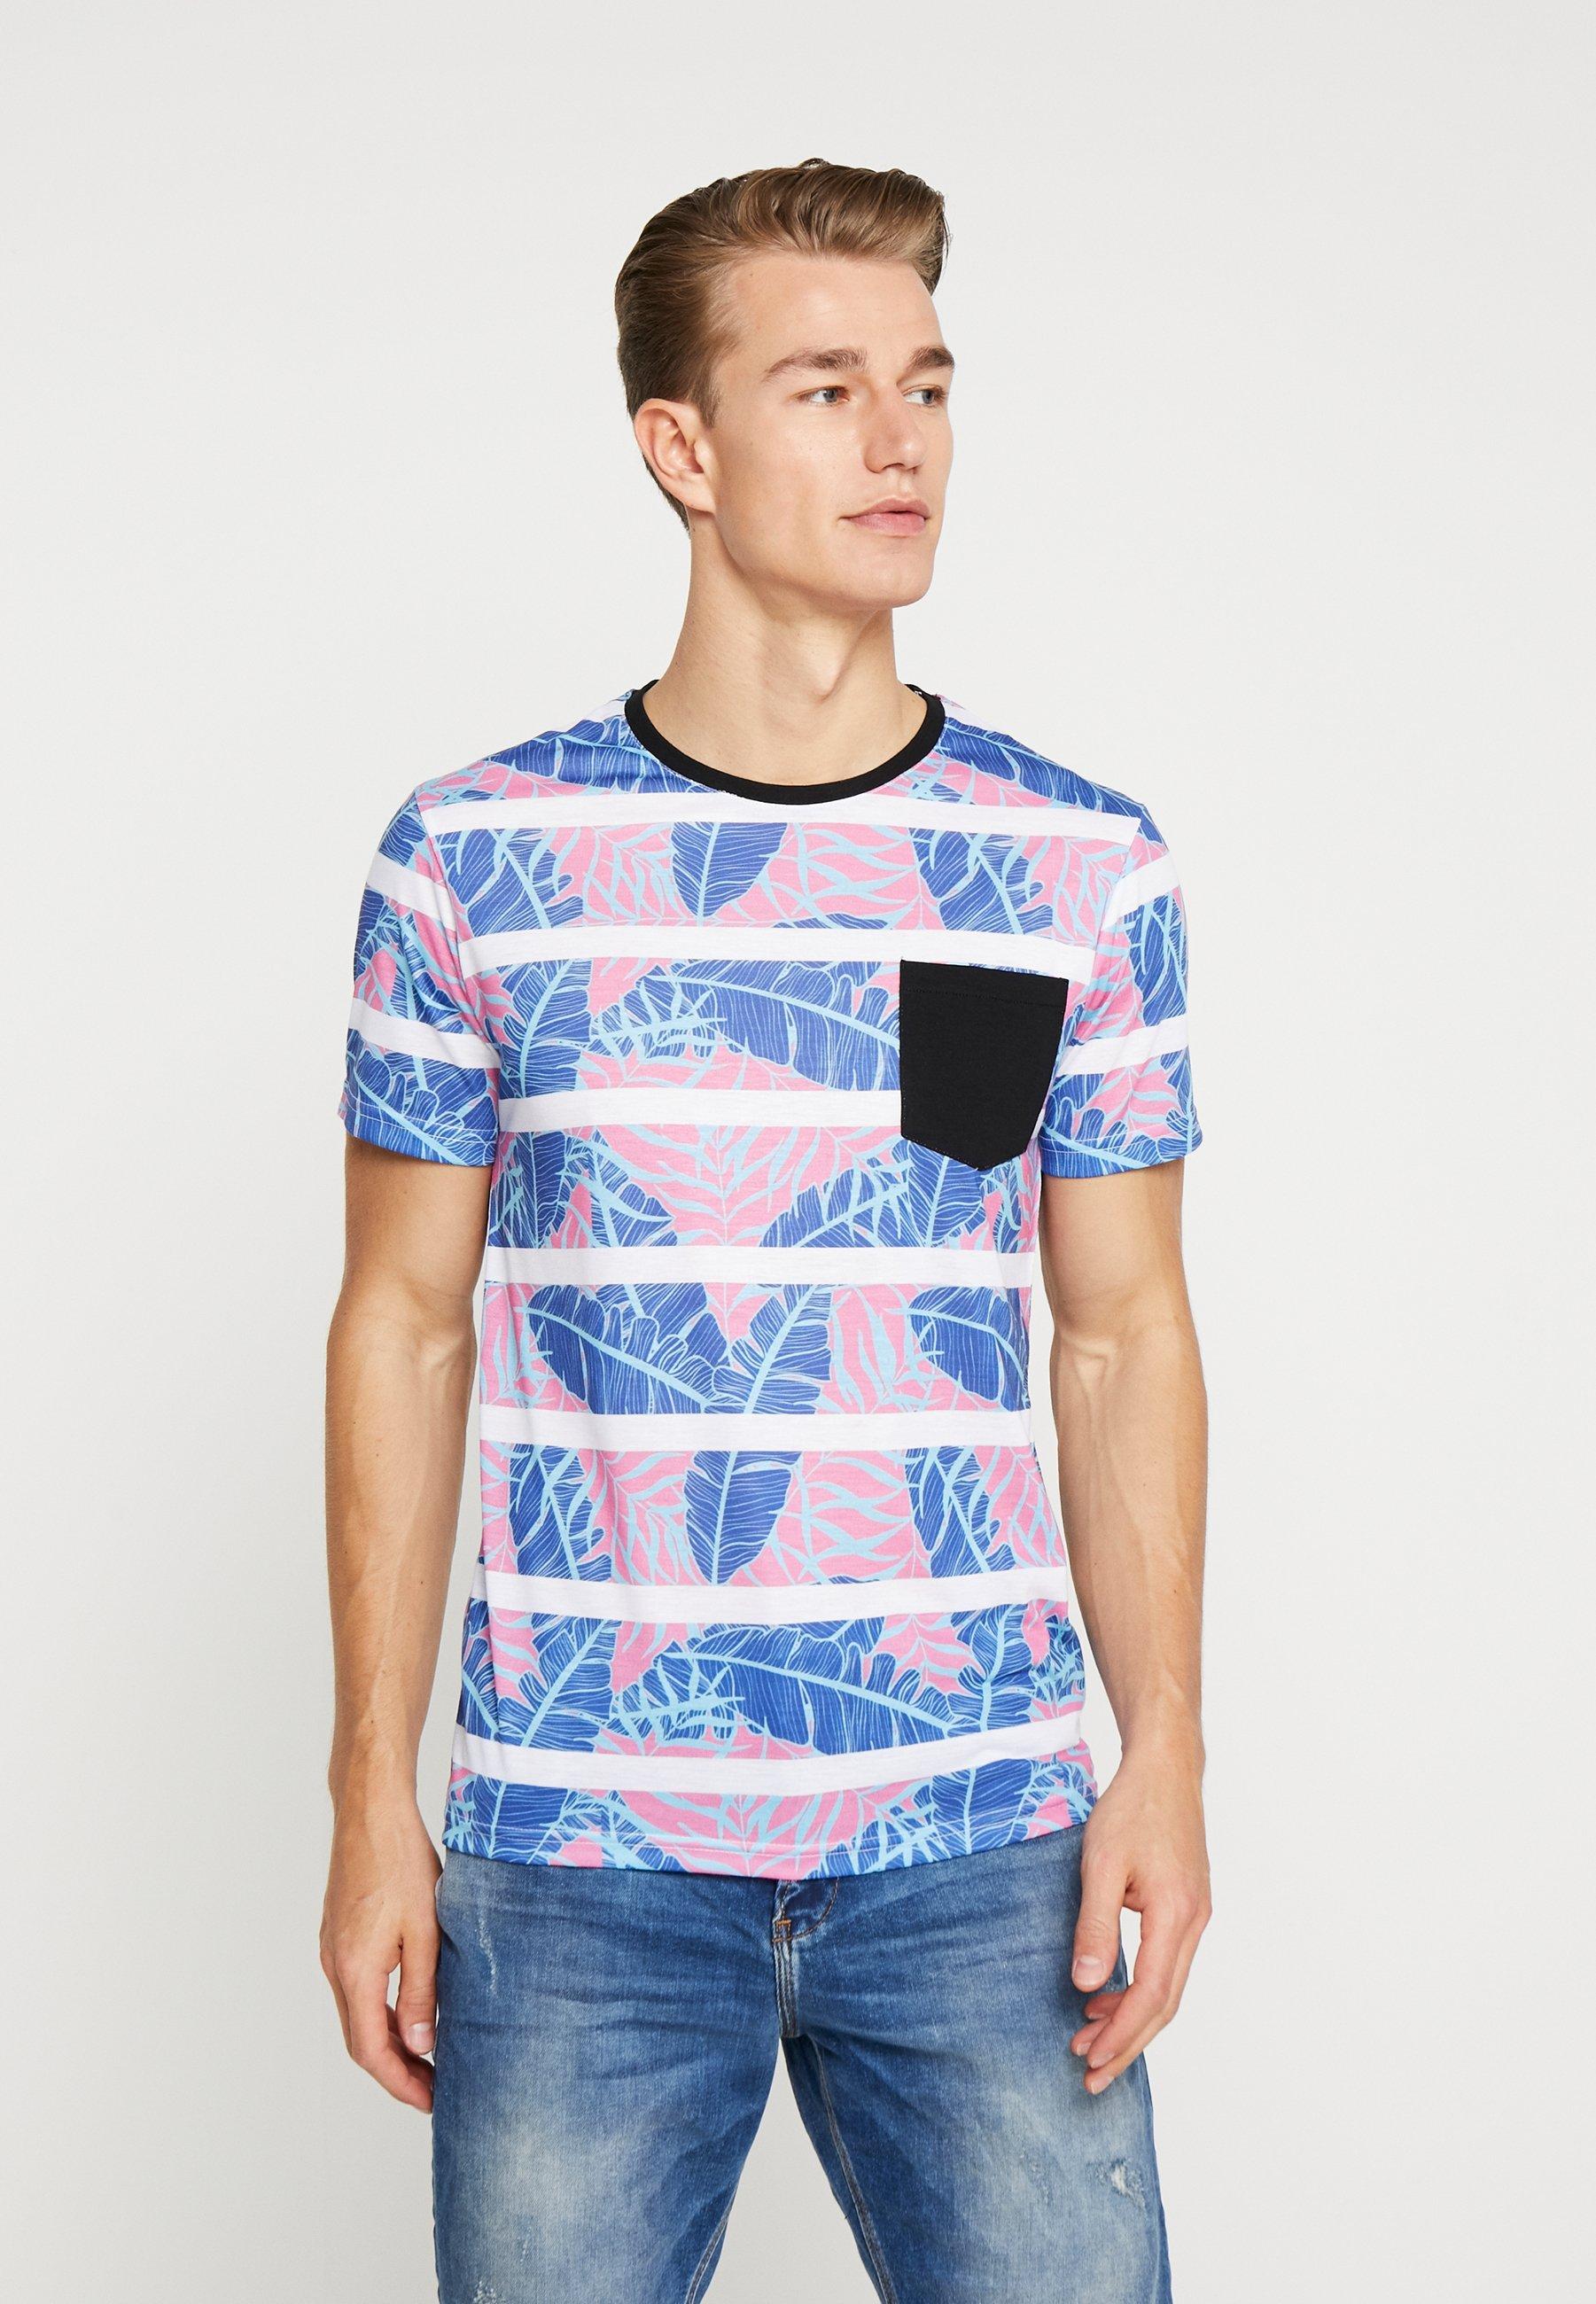 ImpriméDark T One shirt Blue Pier zpMVSU